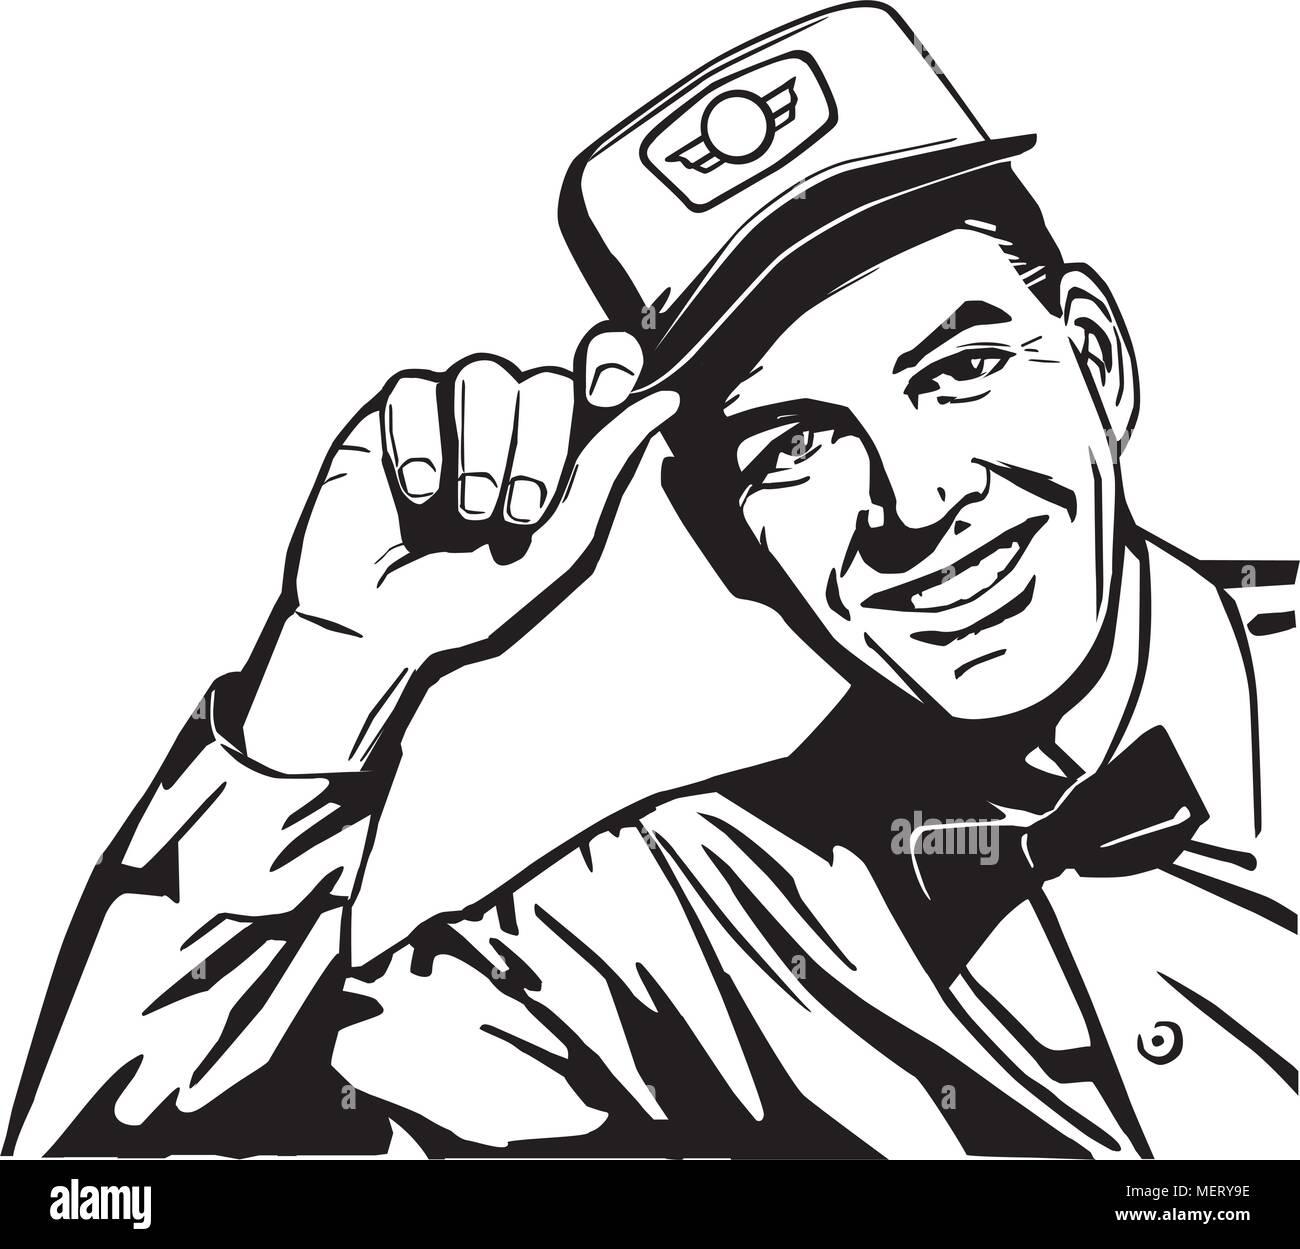 Friendly Service Man - Retro Clipart Illustration - Stock Vector